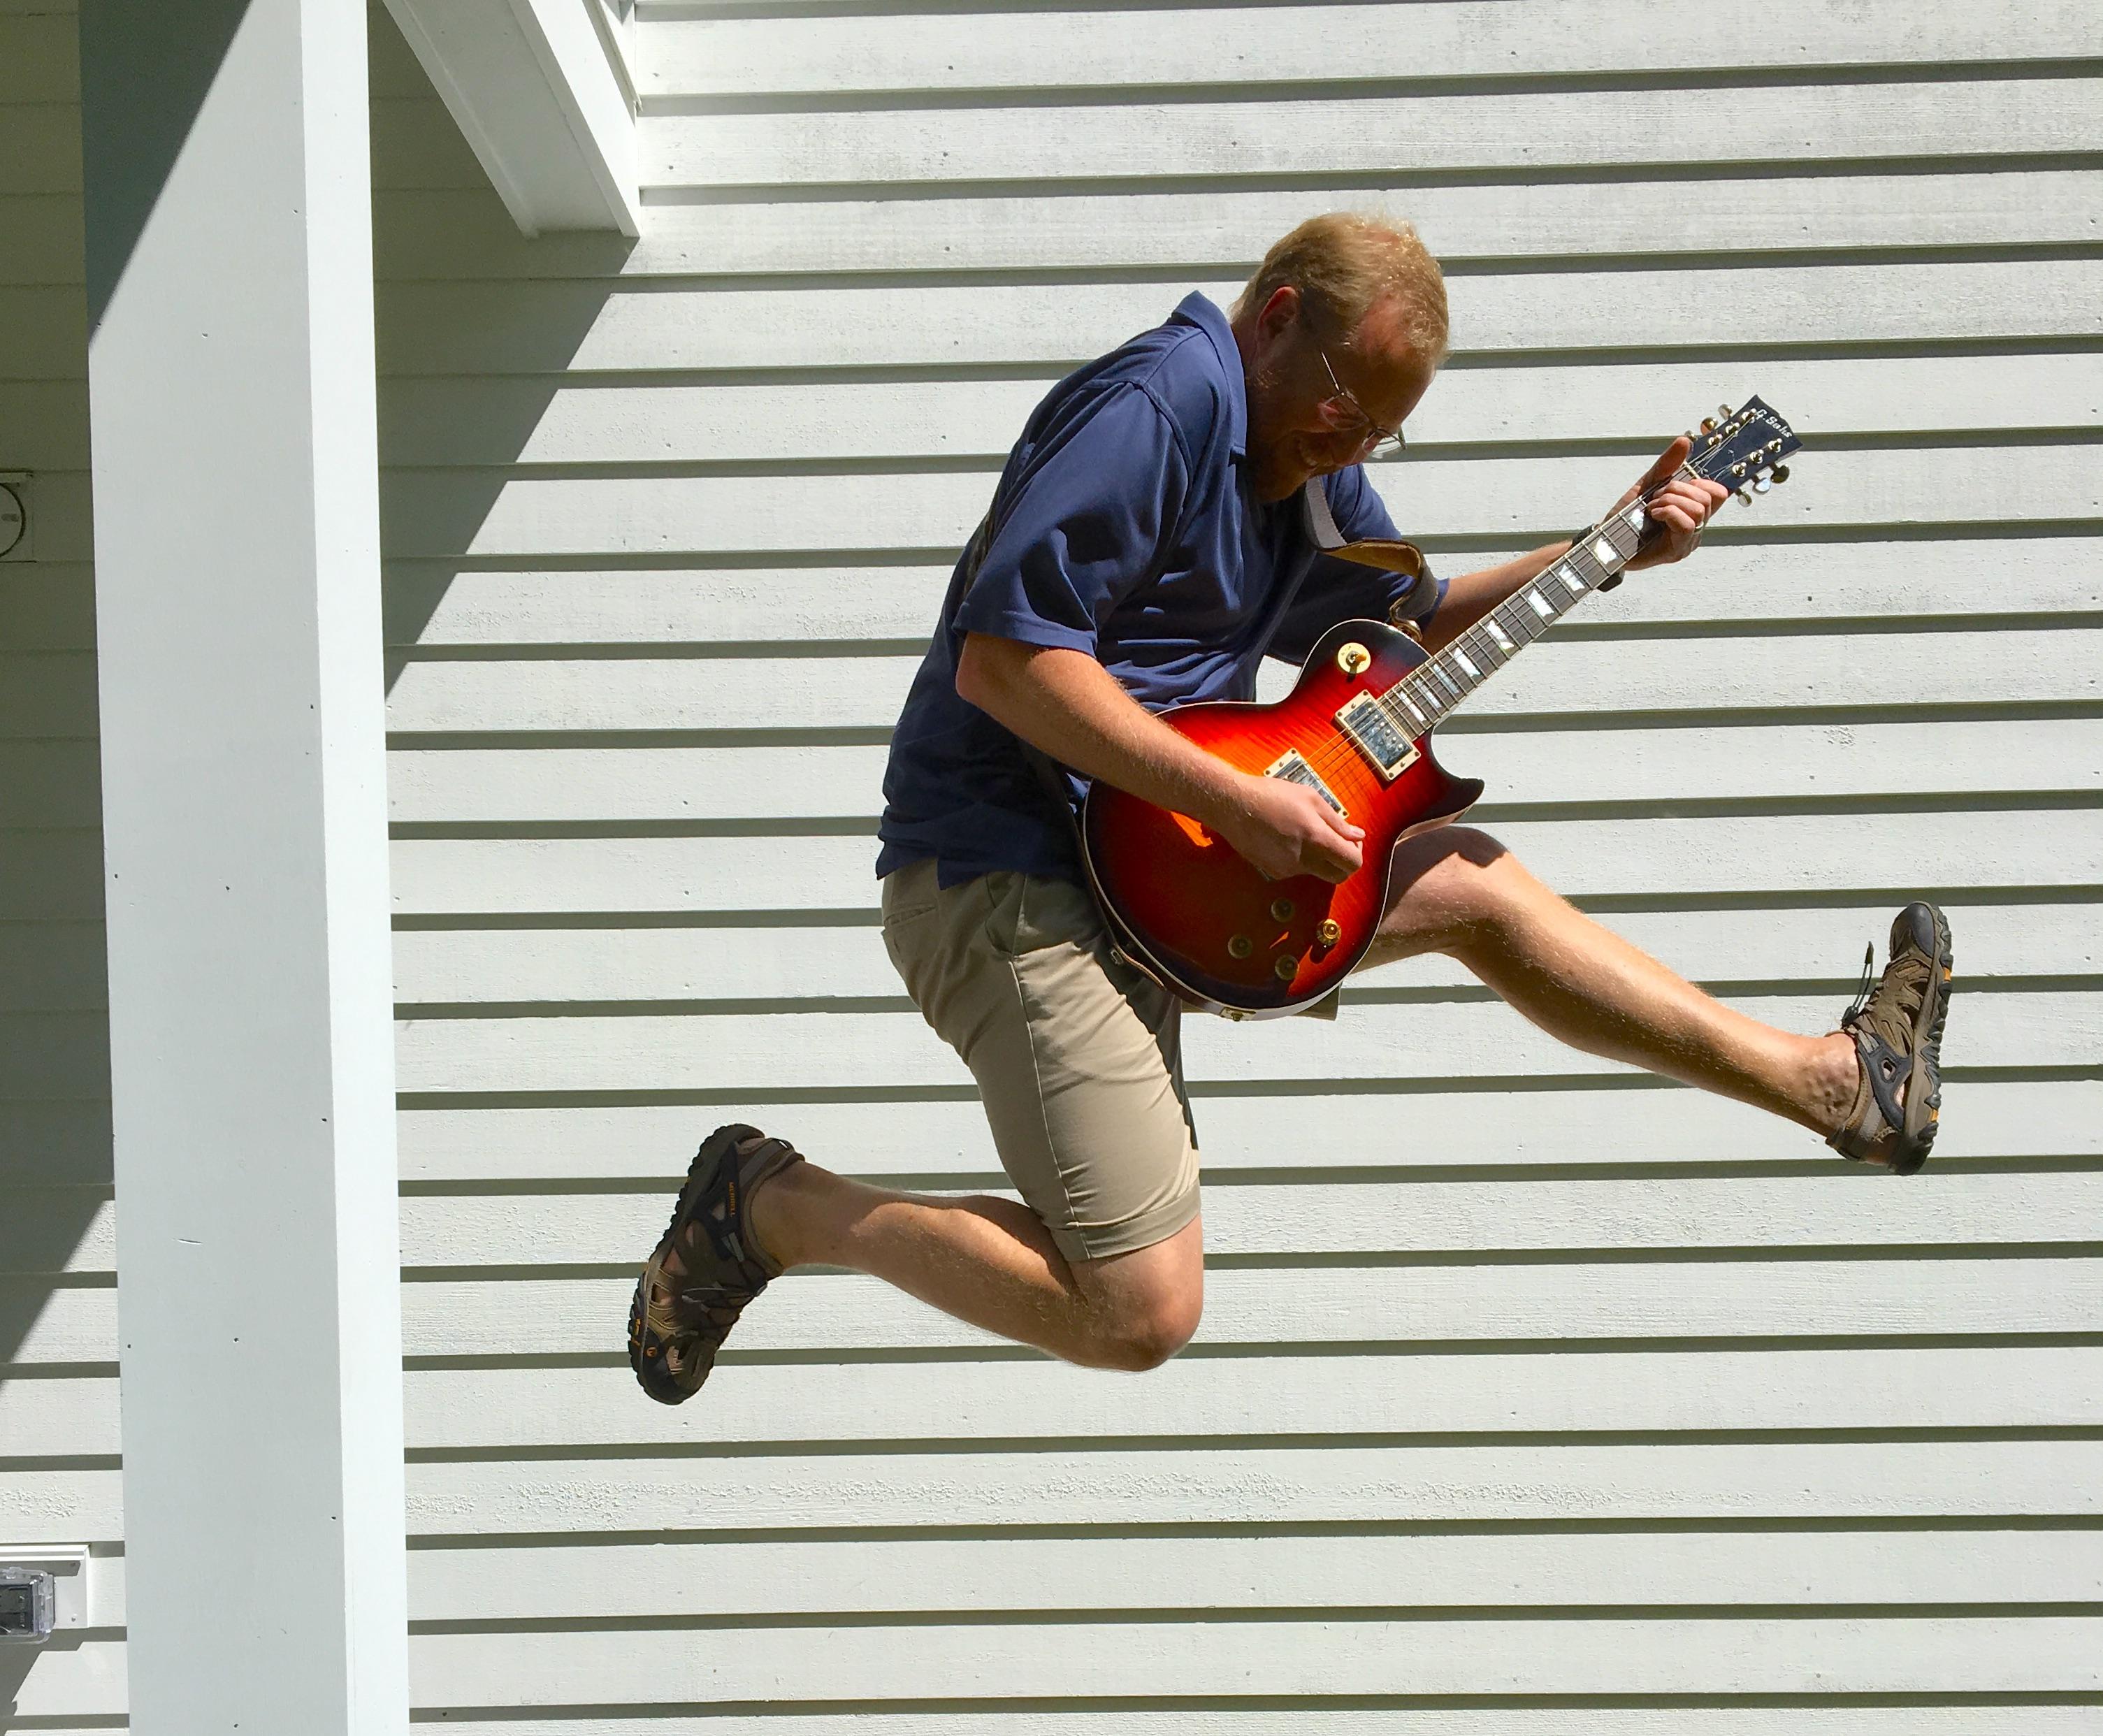 Geoff Sahas Jump.jpg